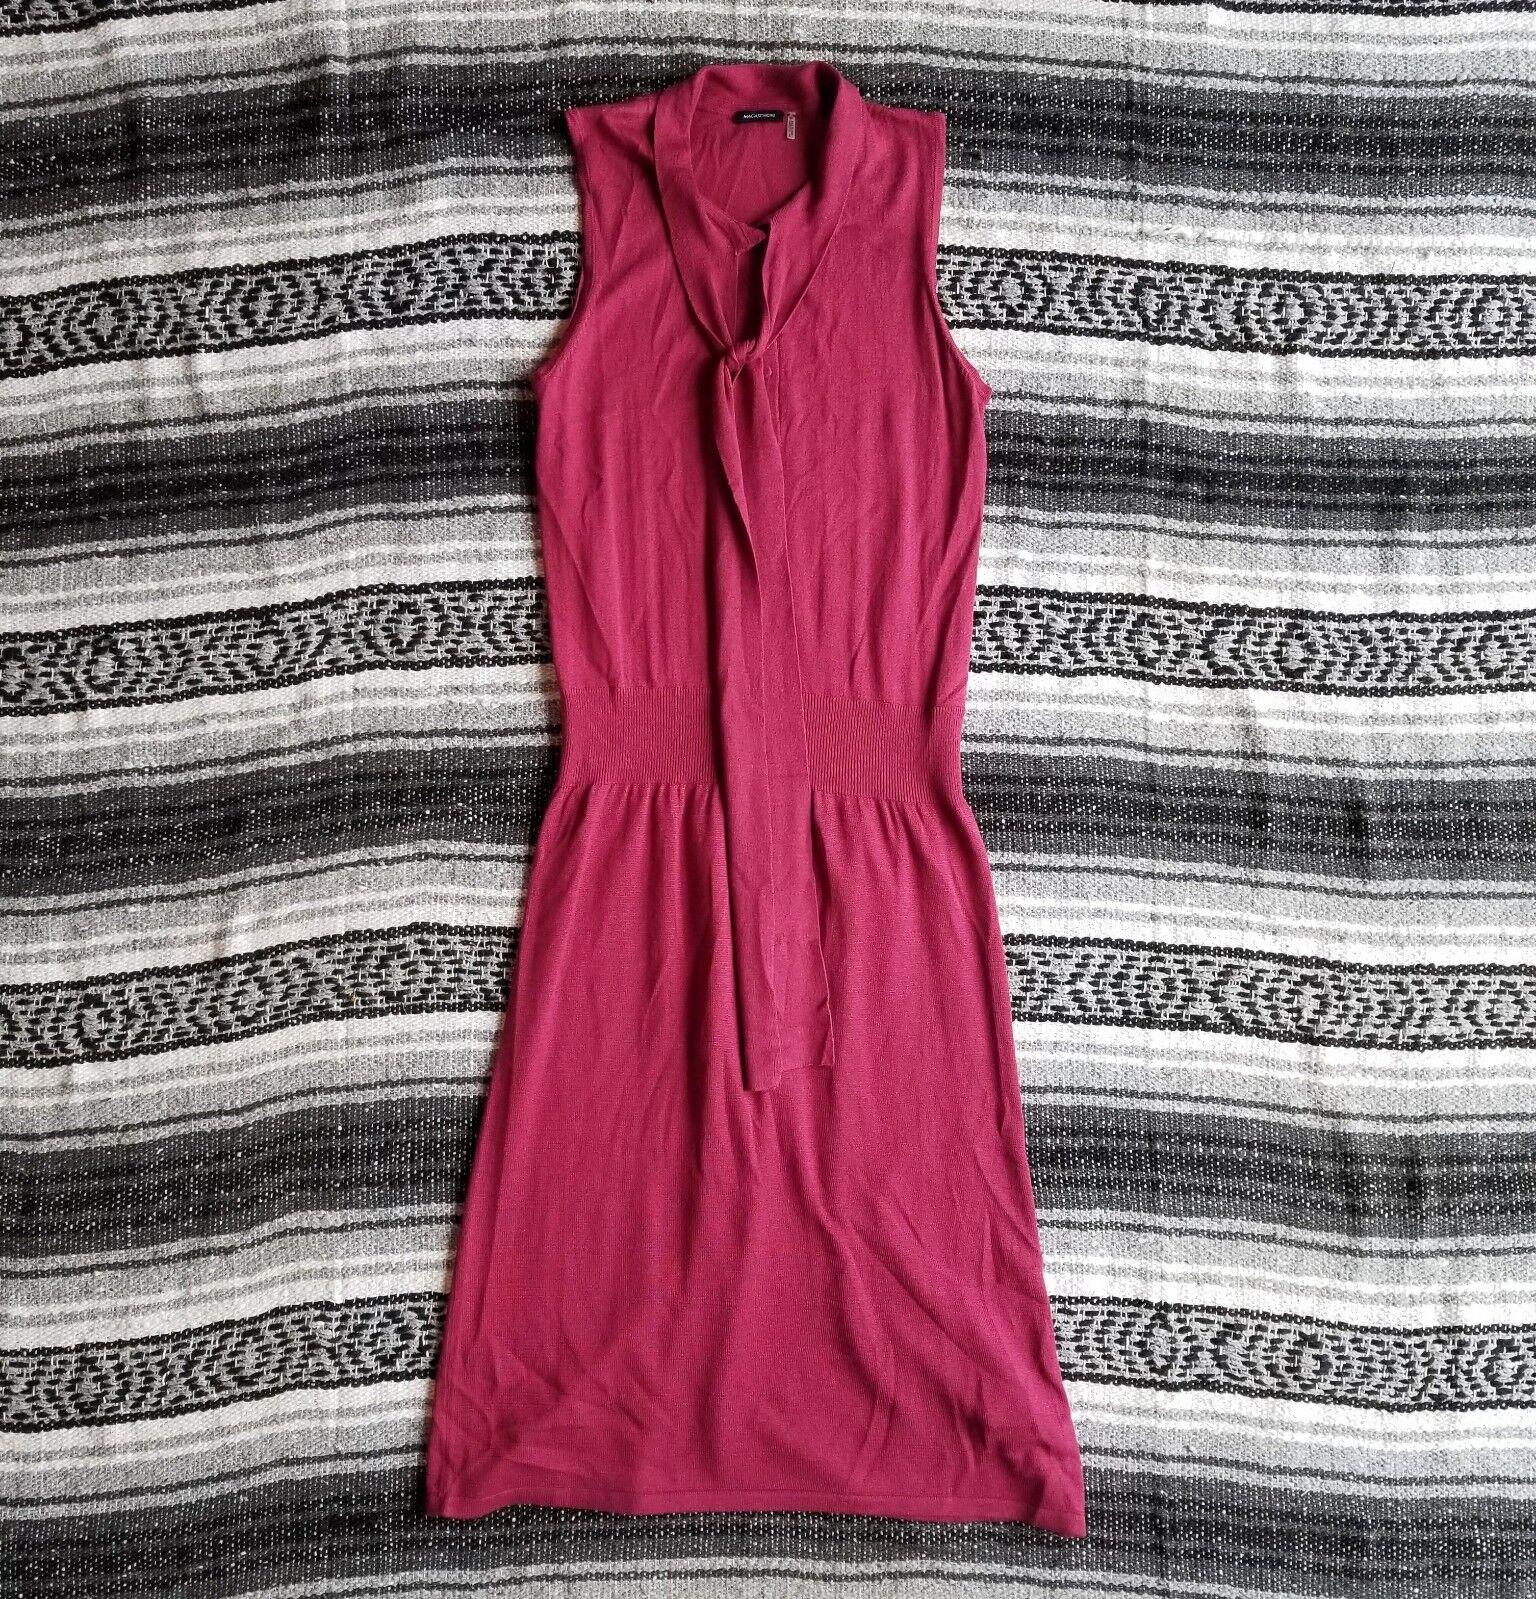 MAGASCHONI Sz S Designer Poppy Red Fine Gauge Silk & Cashmere Knit Sweater Dress